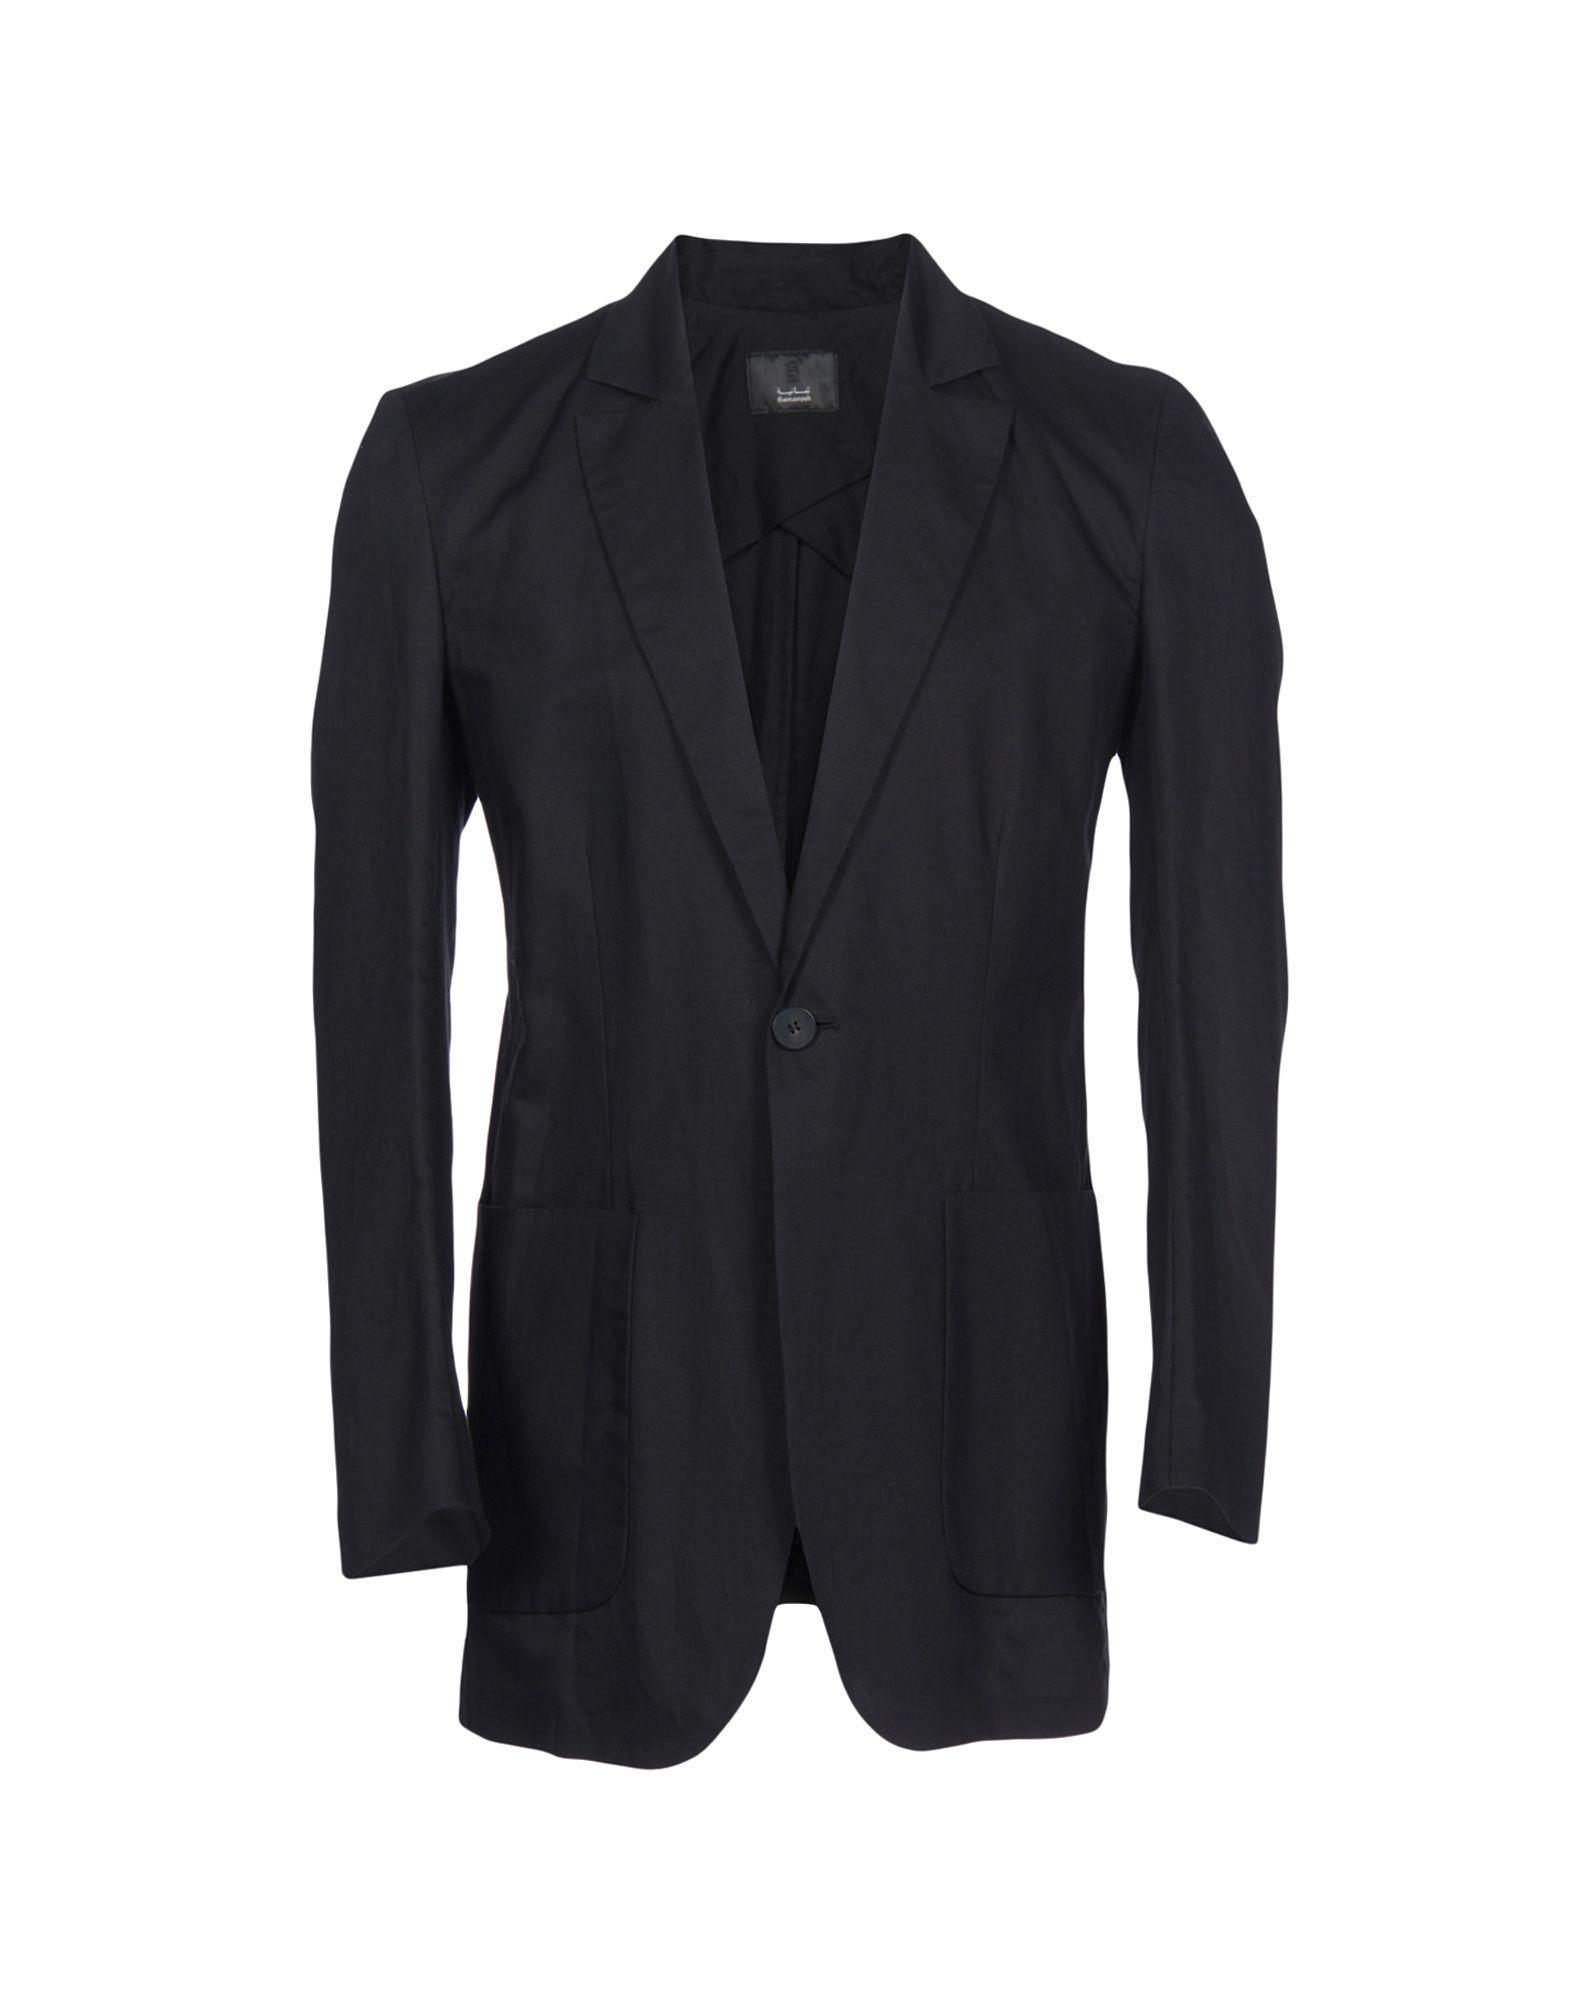 THAMANYAH Blazer in Black